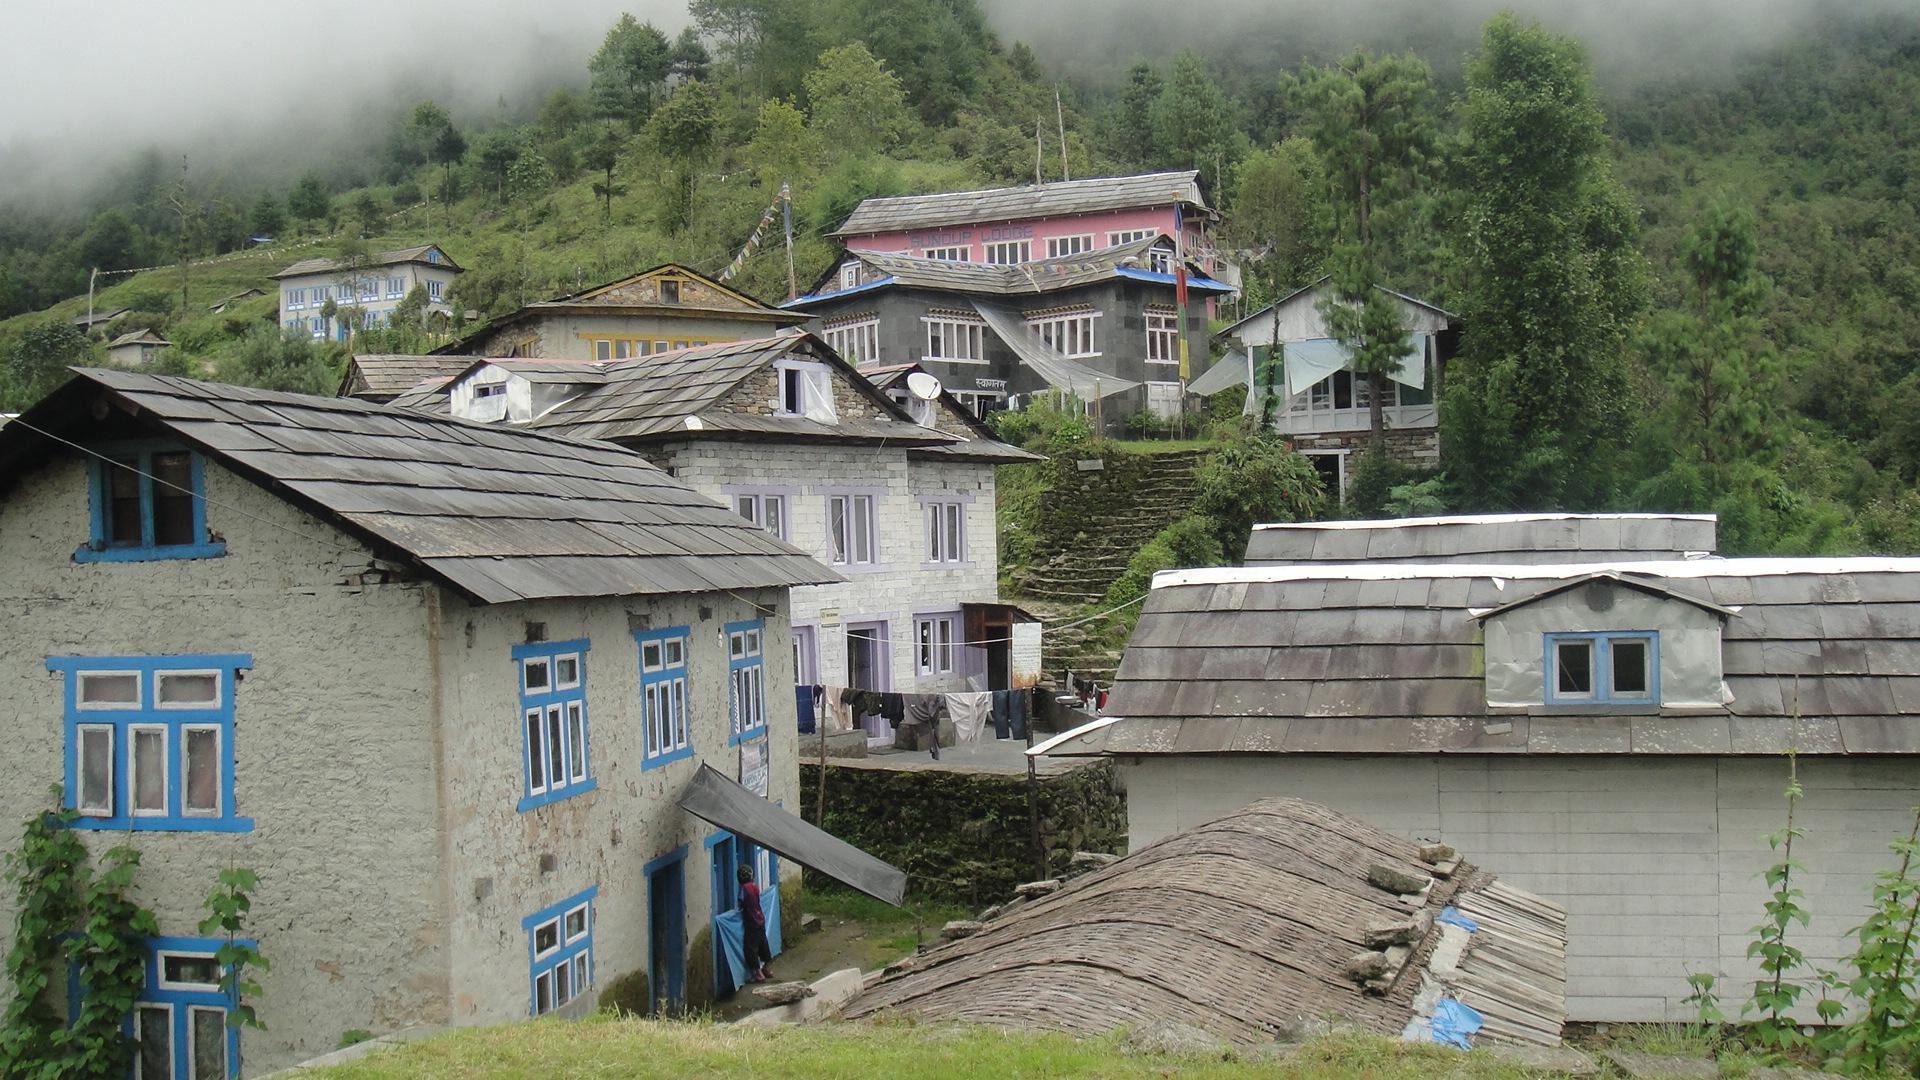 Khumbu_Villages_Adventure_Alternative_Nepal.JPG